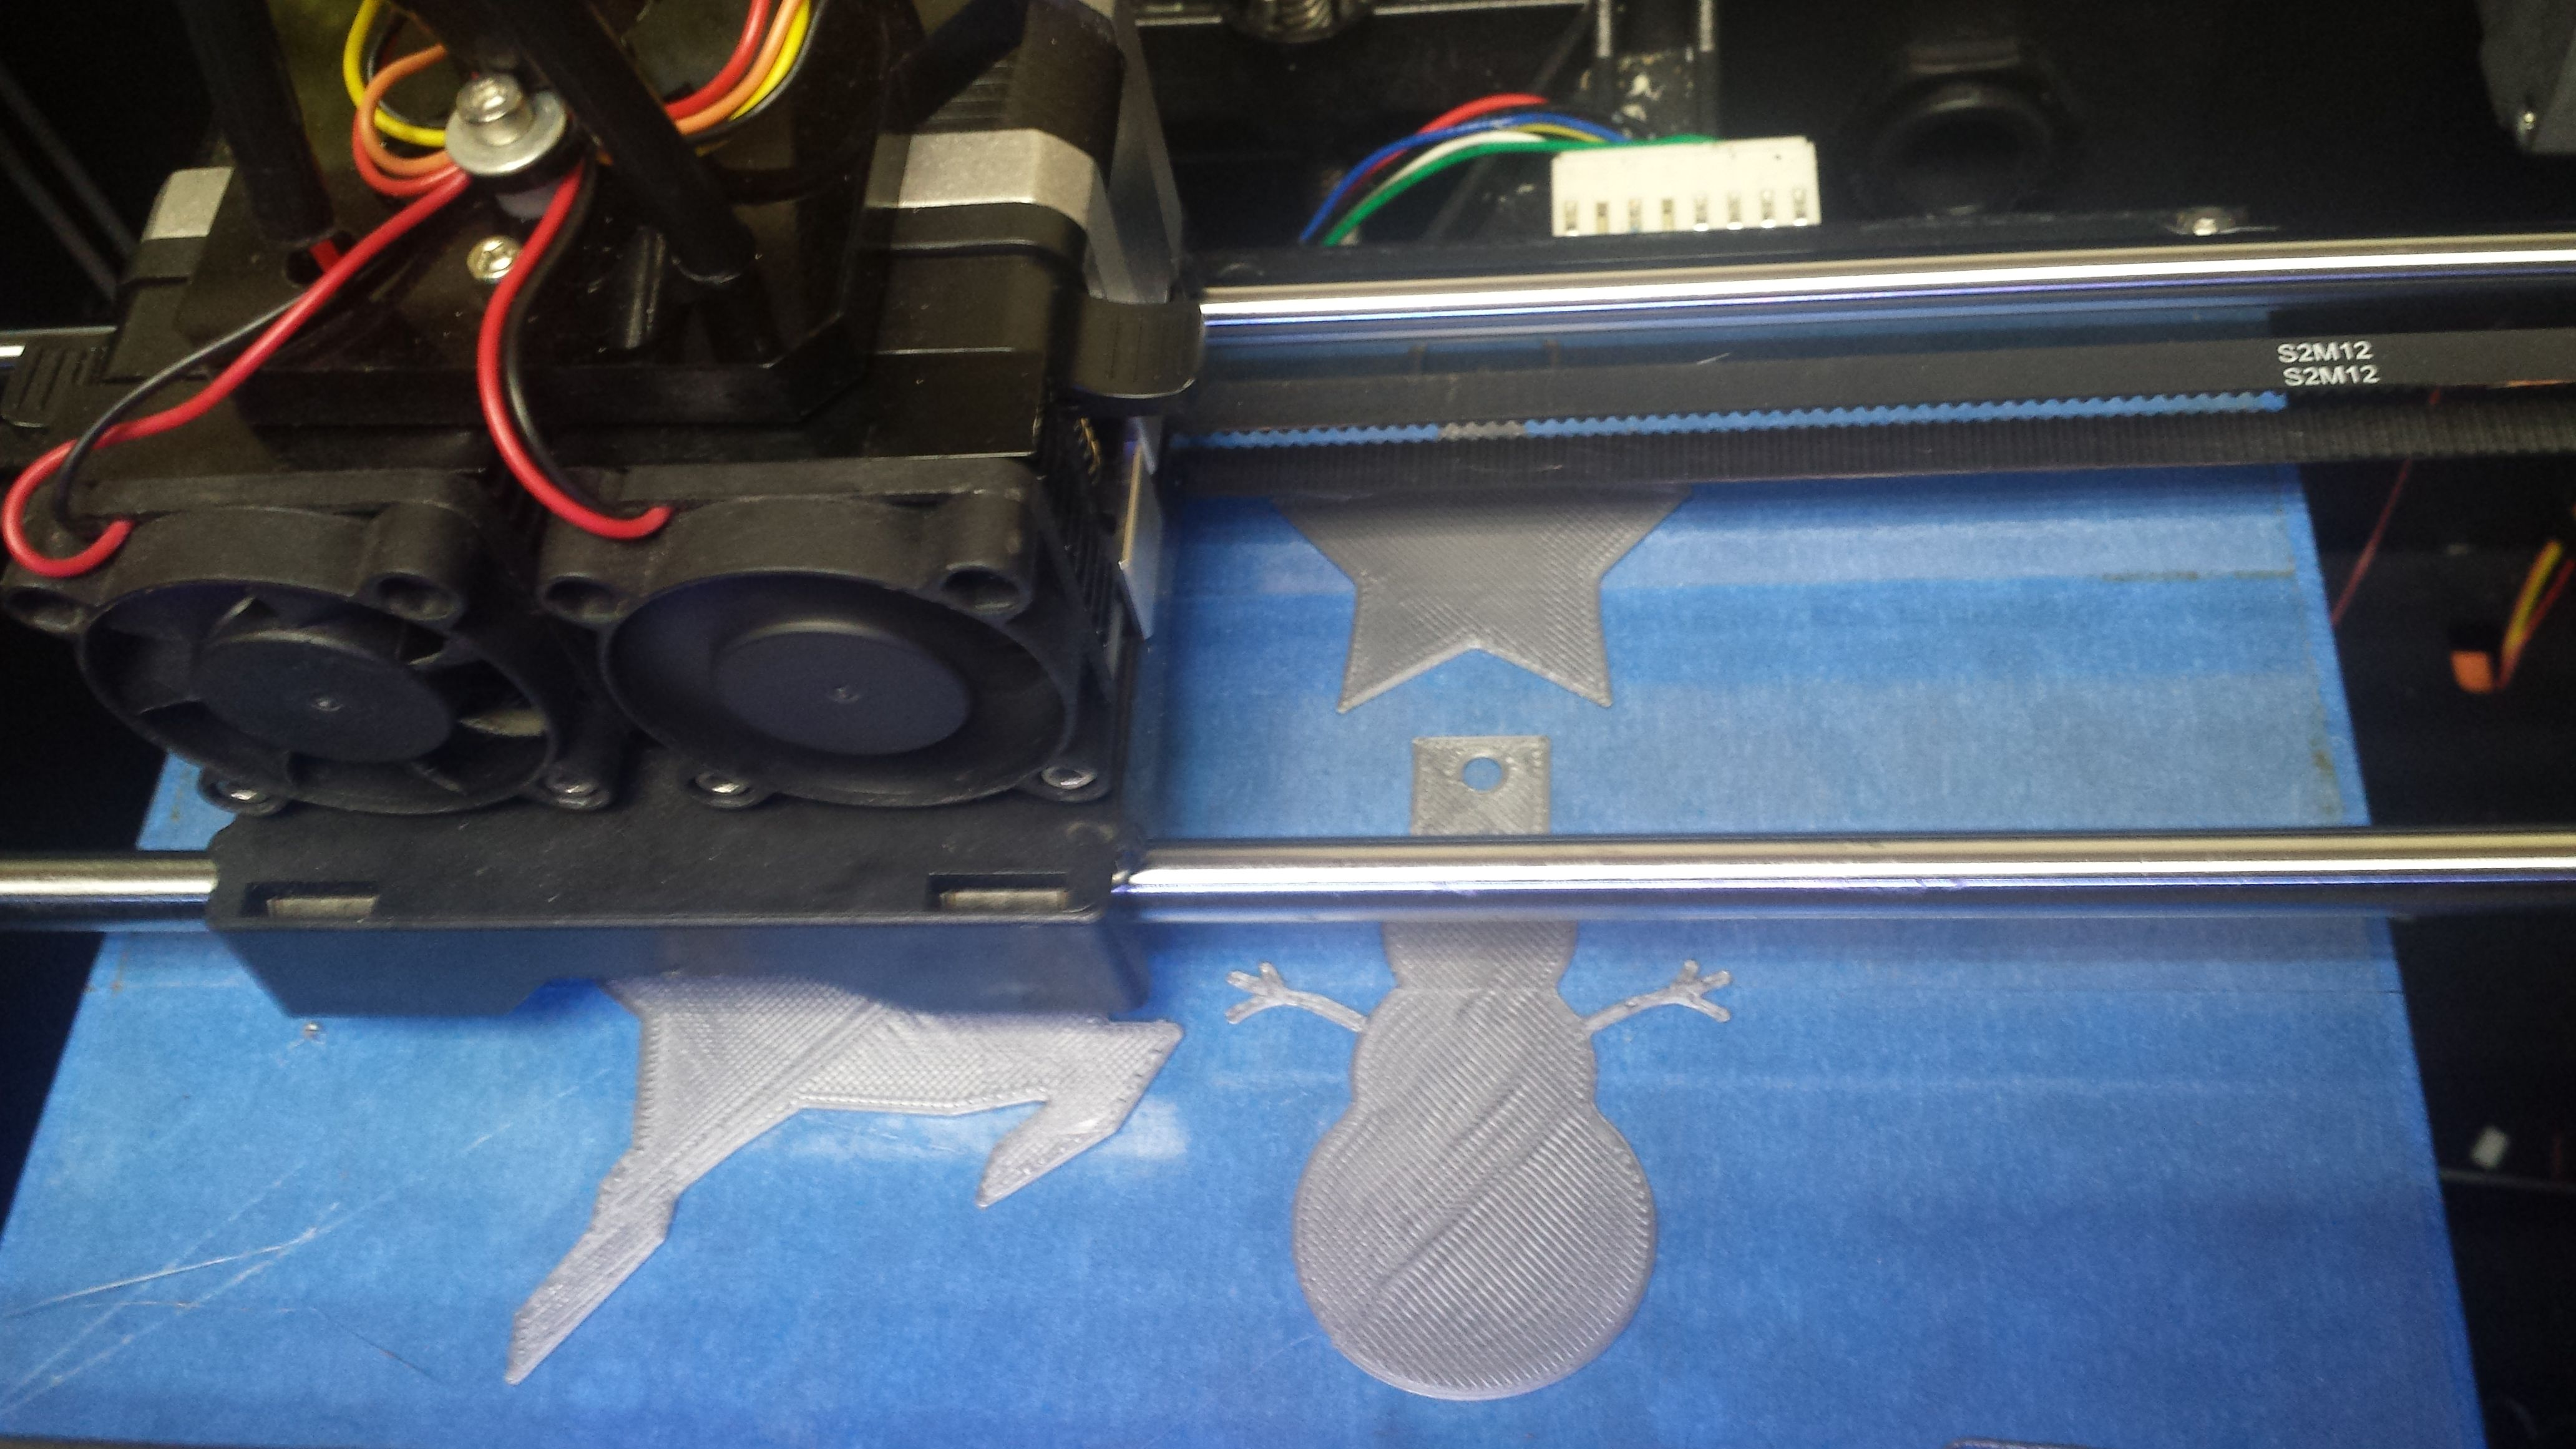 impresoras #3dcpi #3dprinter #3dprinting